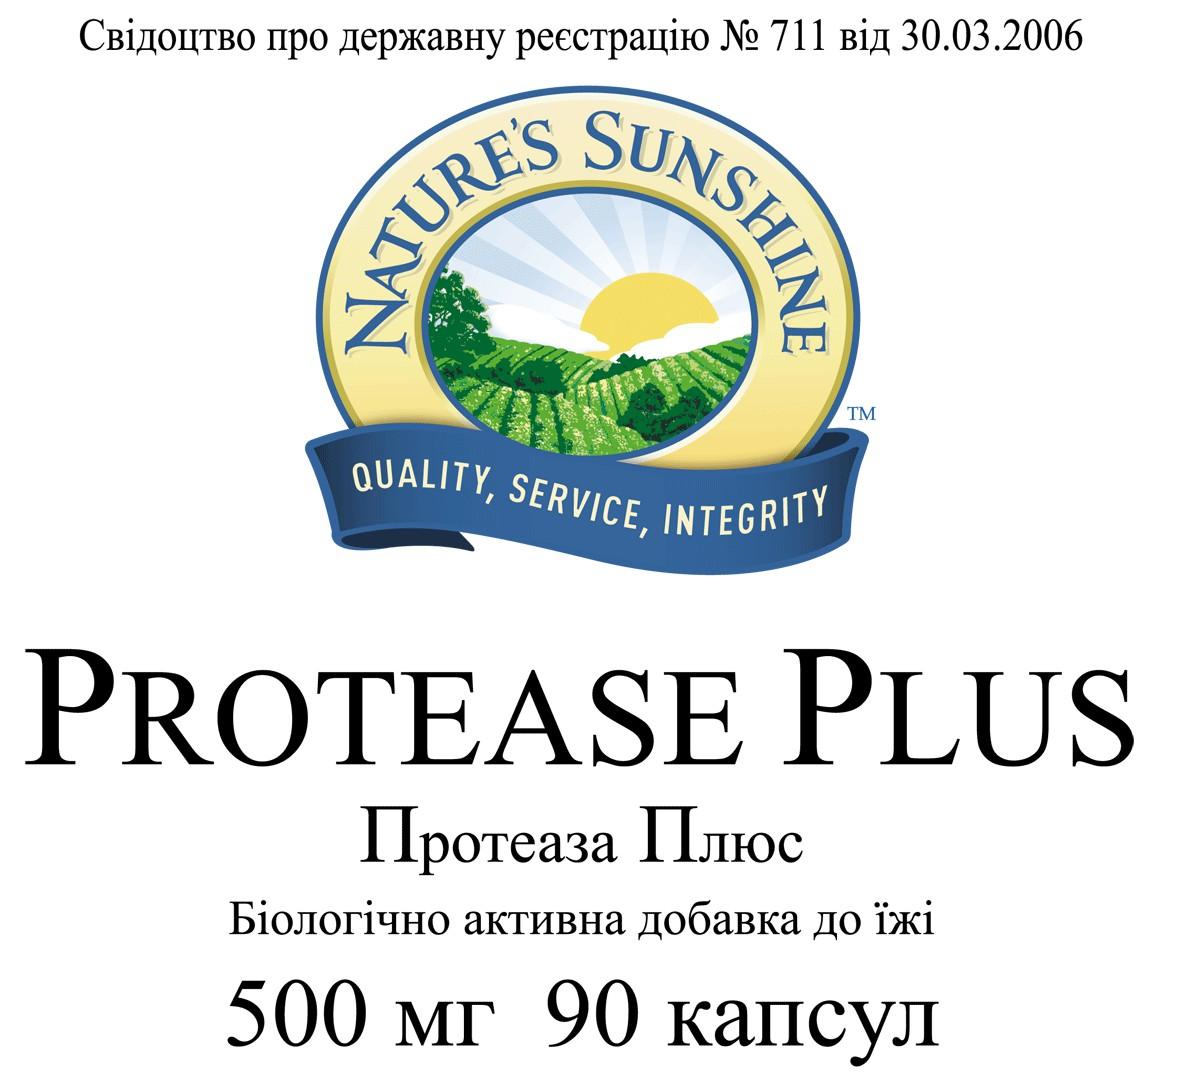 Protease Plus [1841] (-20%)